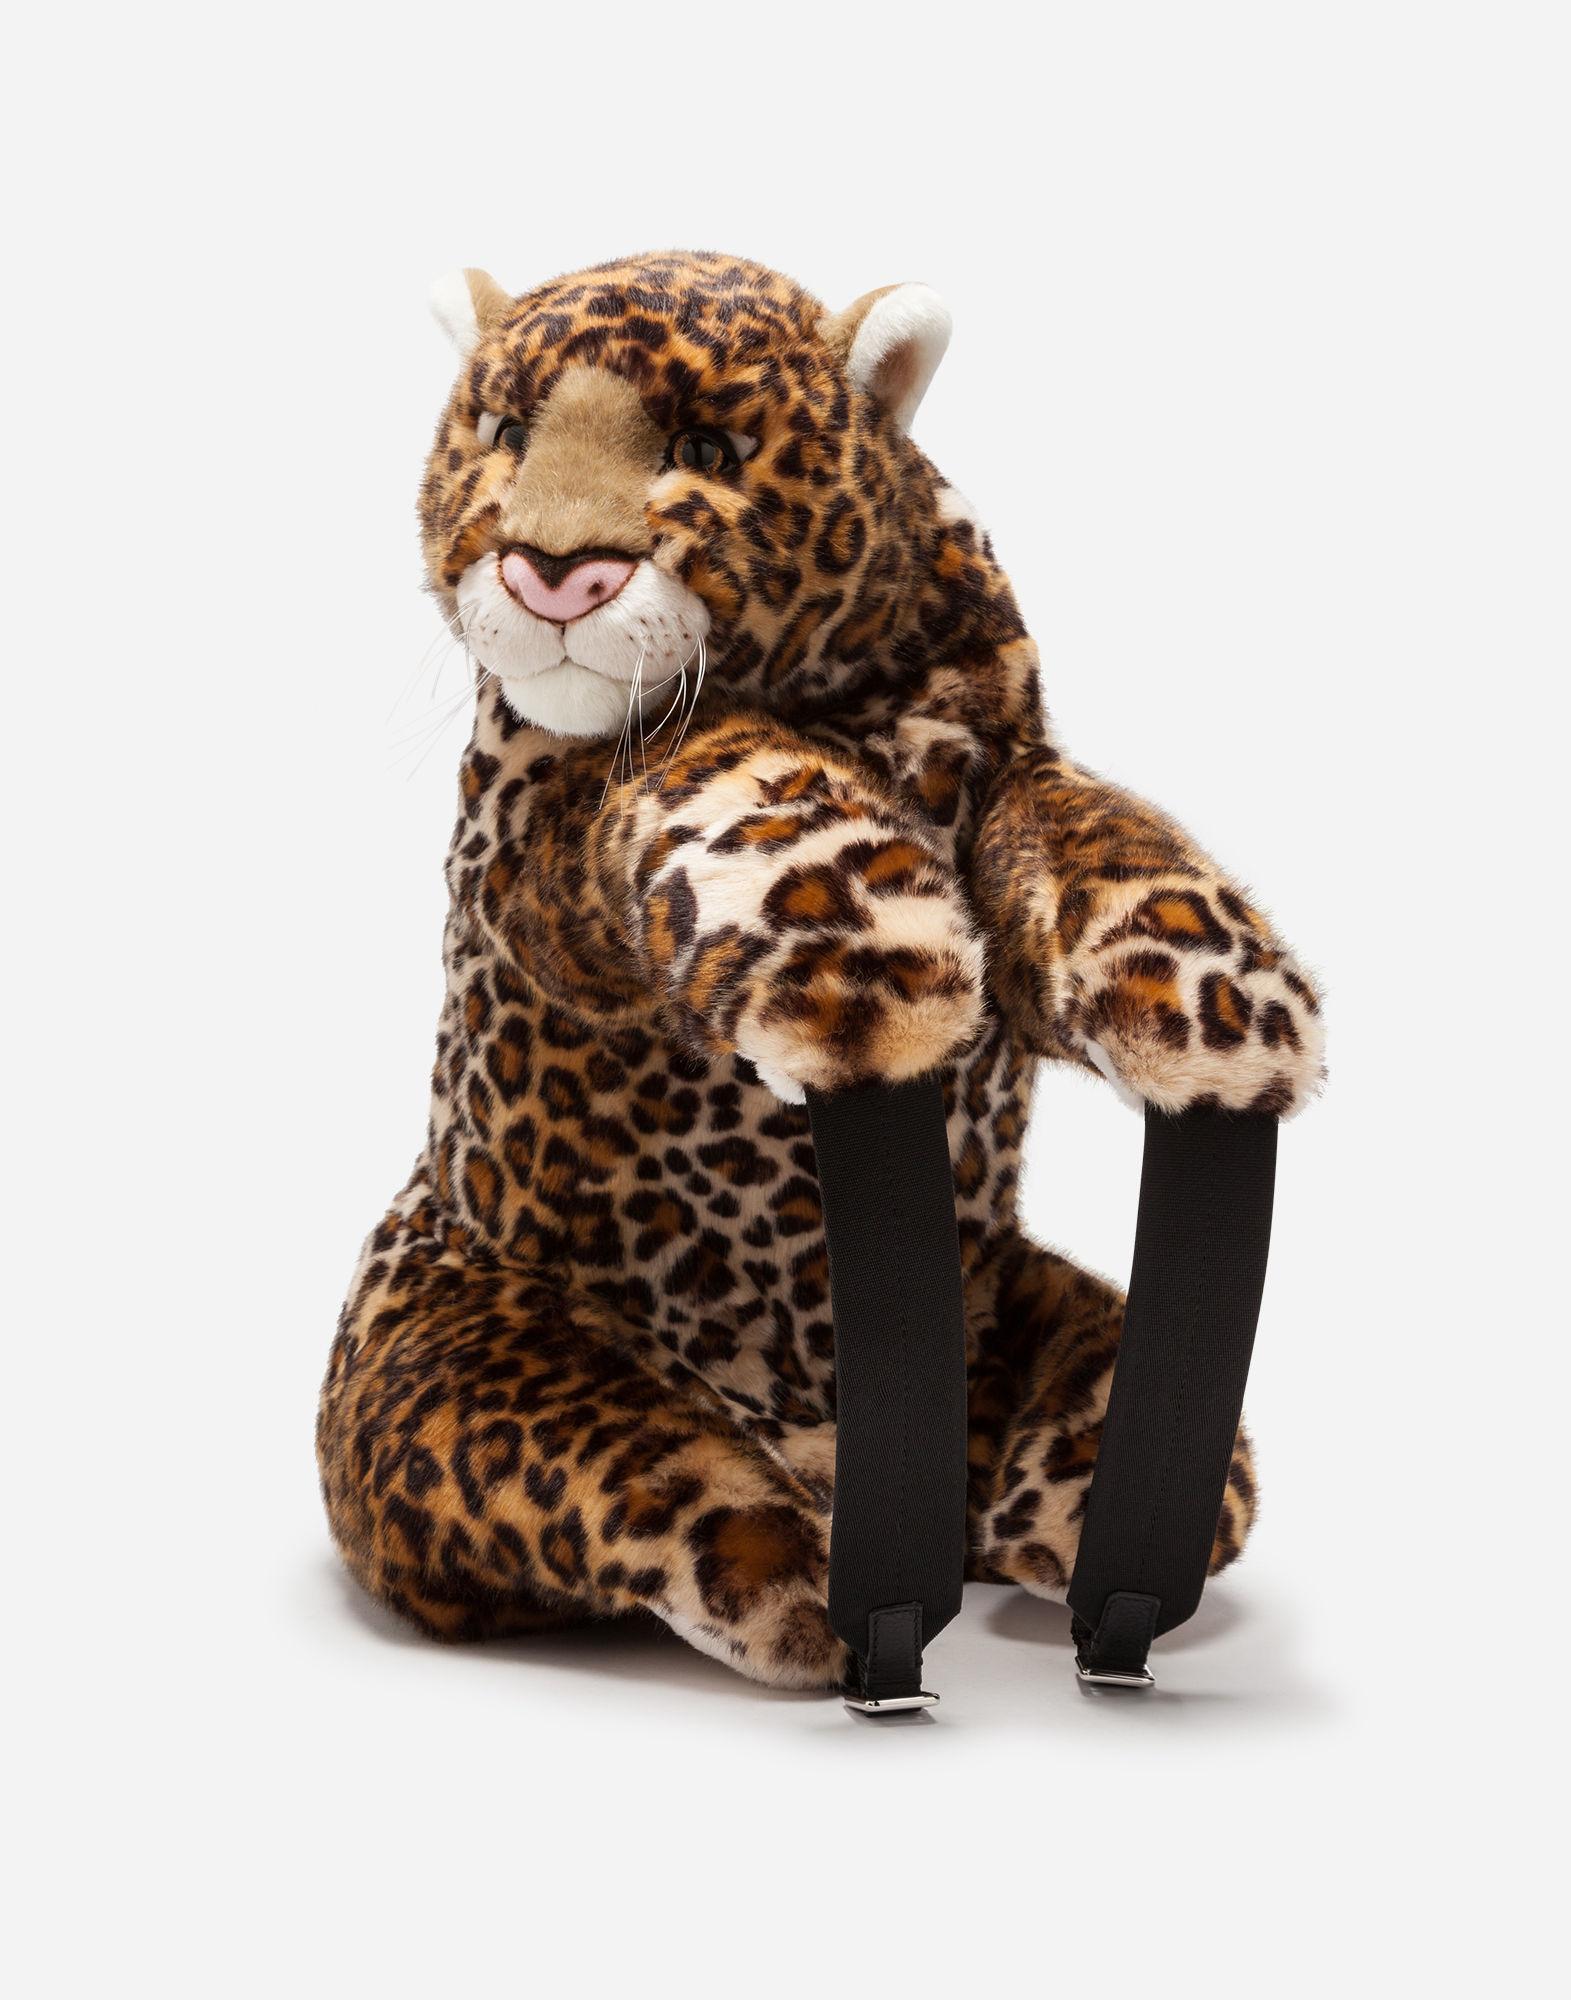 Dolce & Gabbana Backpack In Leopard Faux Fur In Neutrals